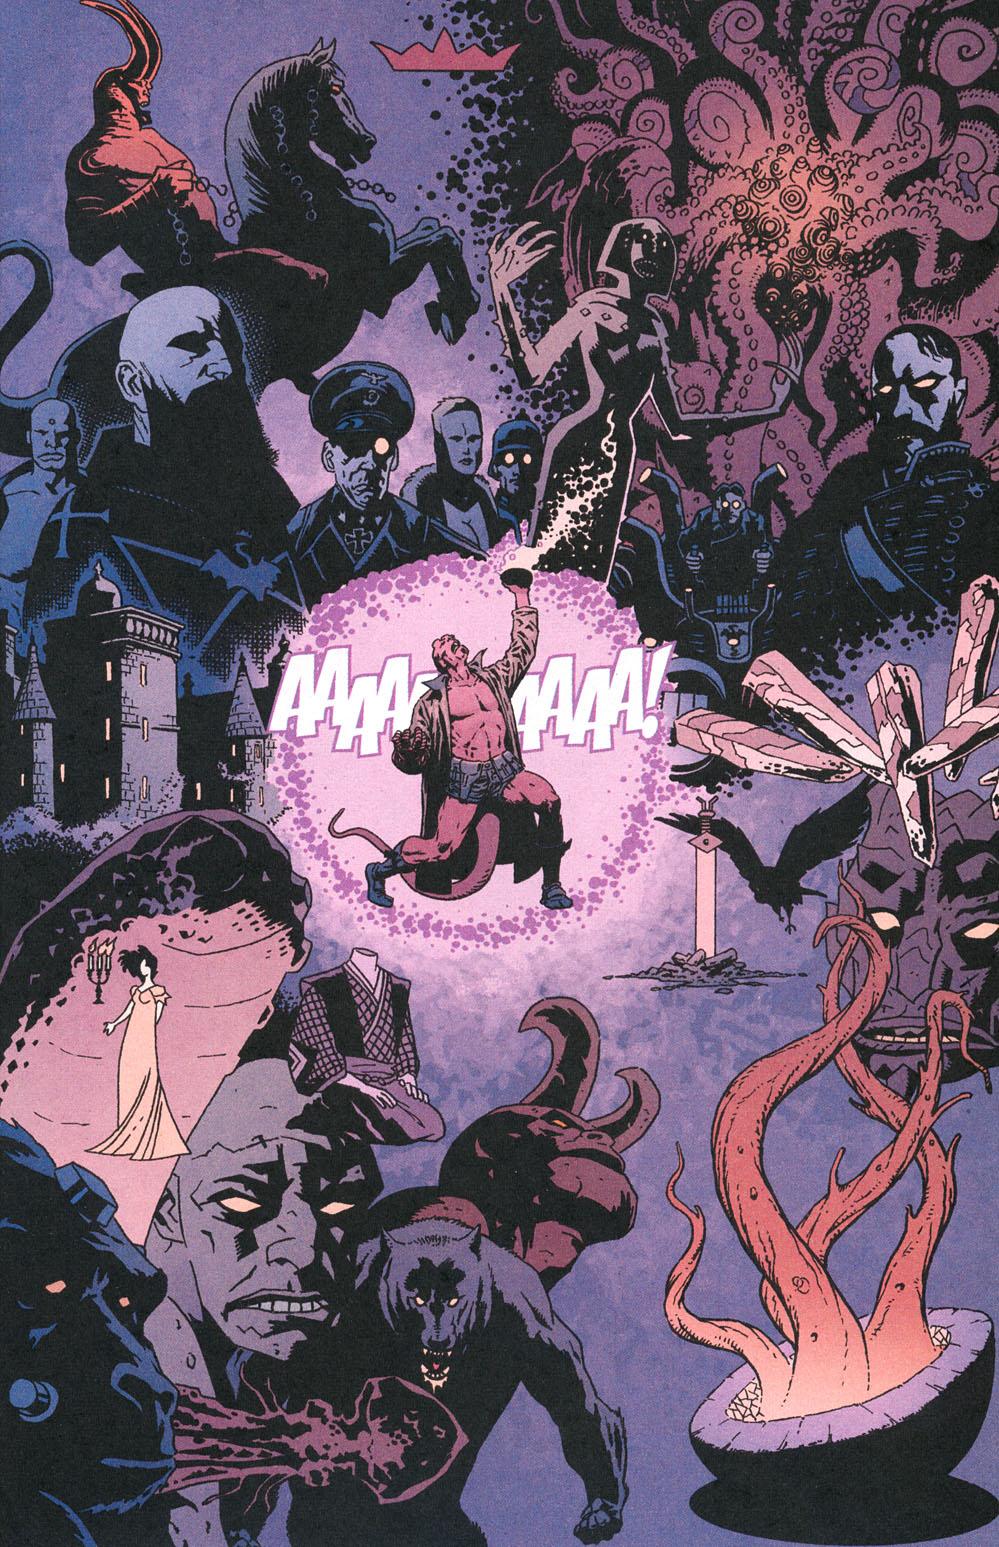 Read online Hellboy: Weird Tales comic -  Issue #5 - 23